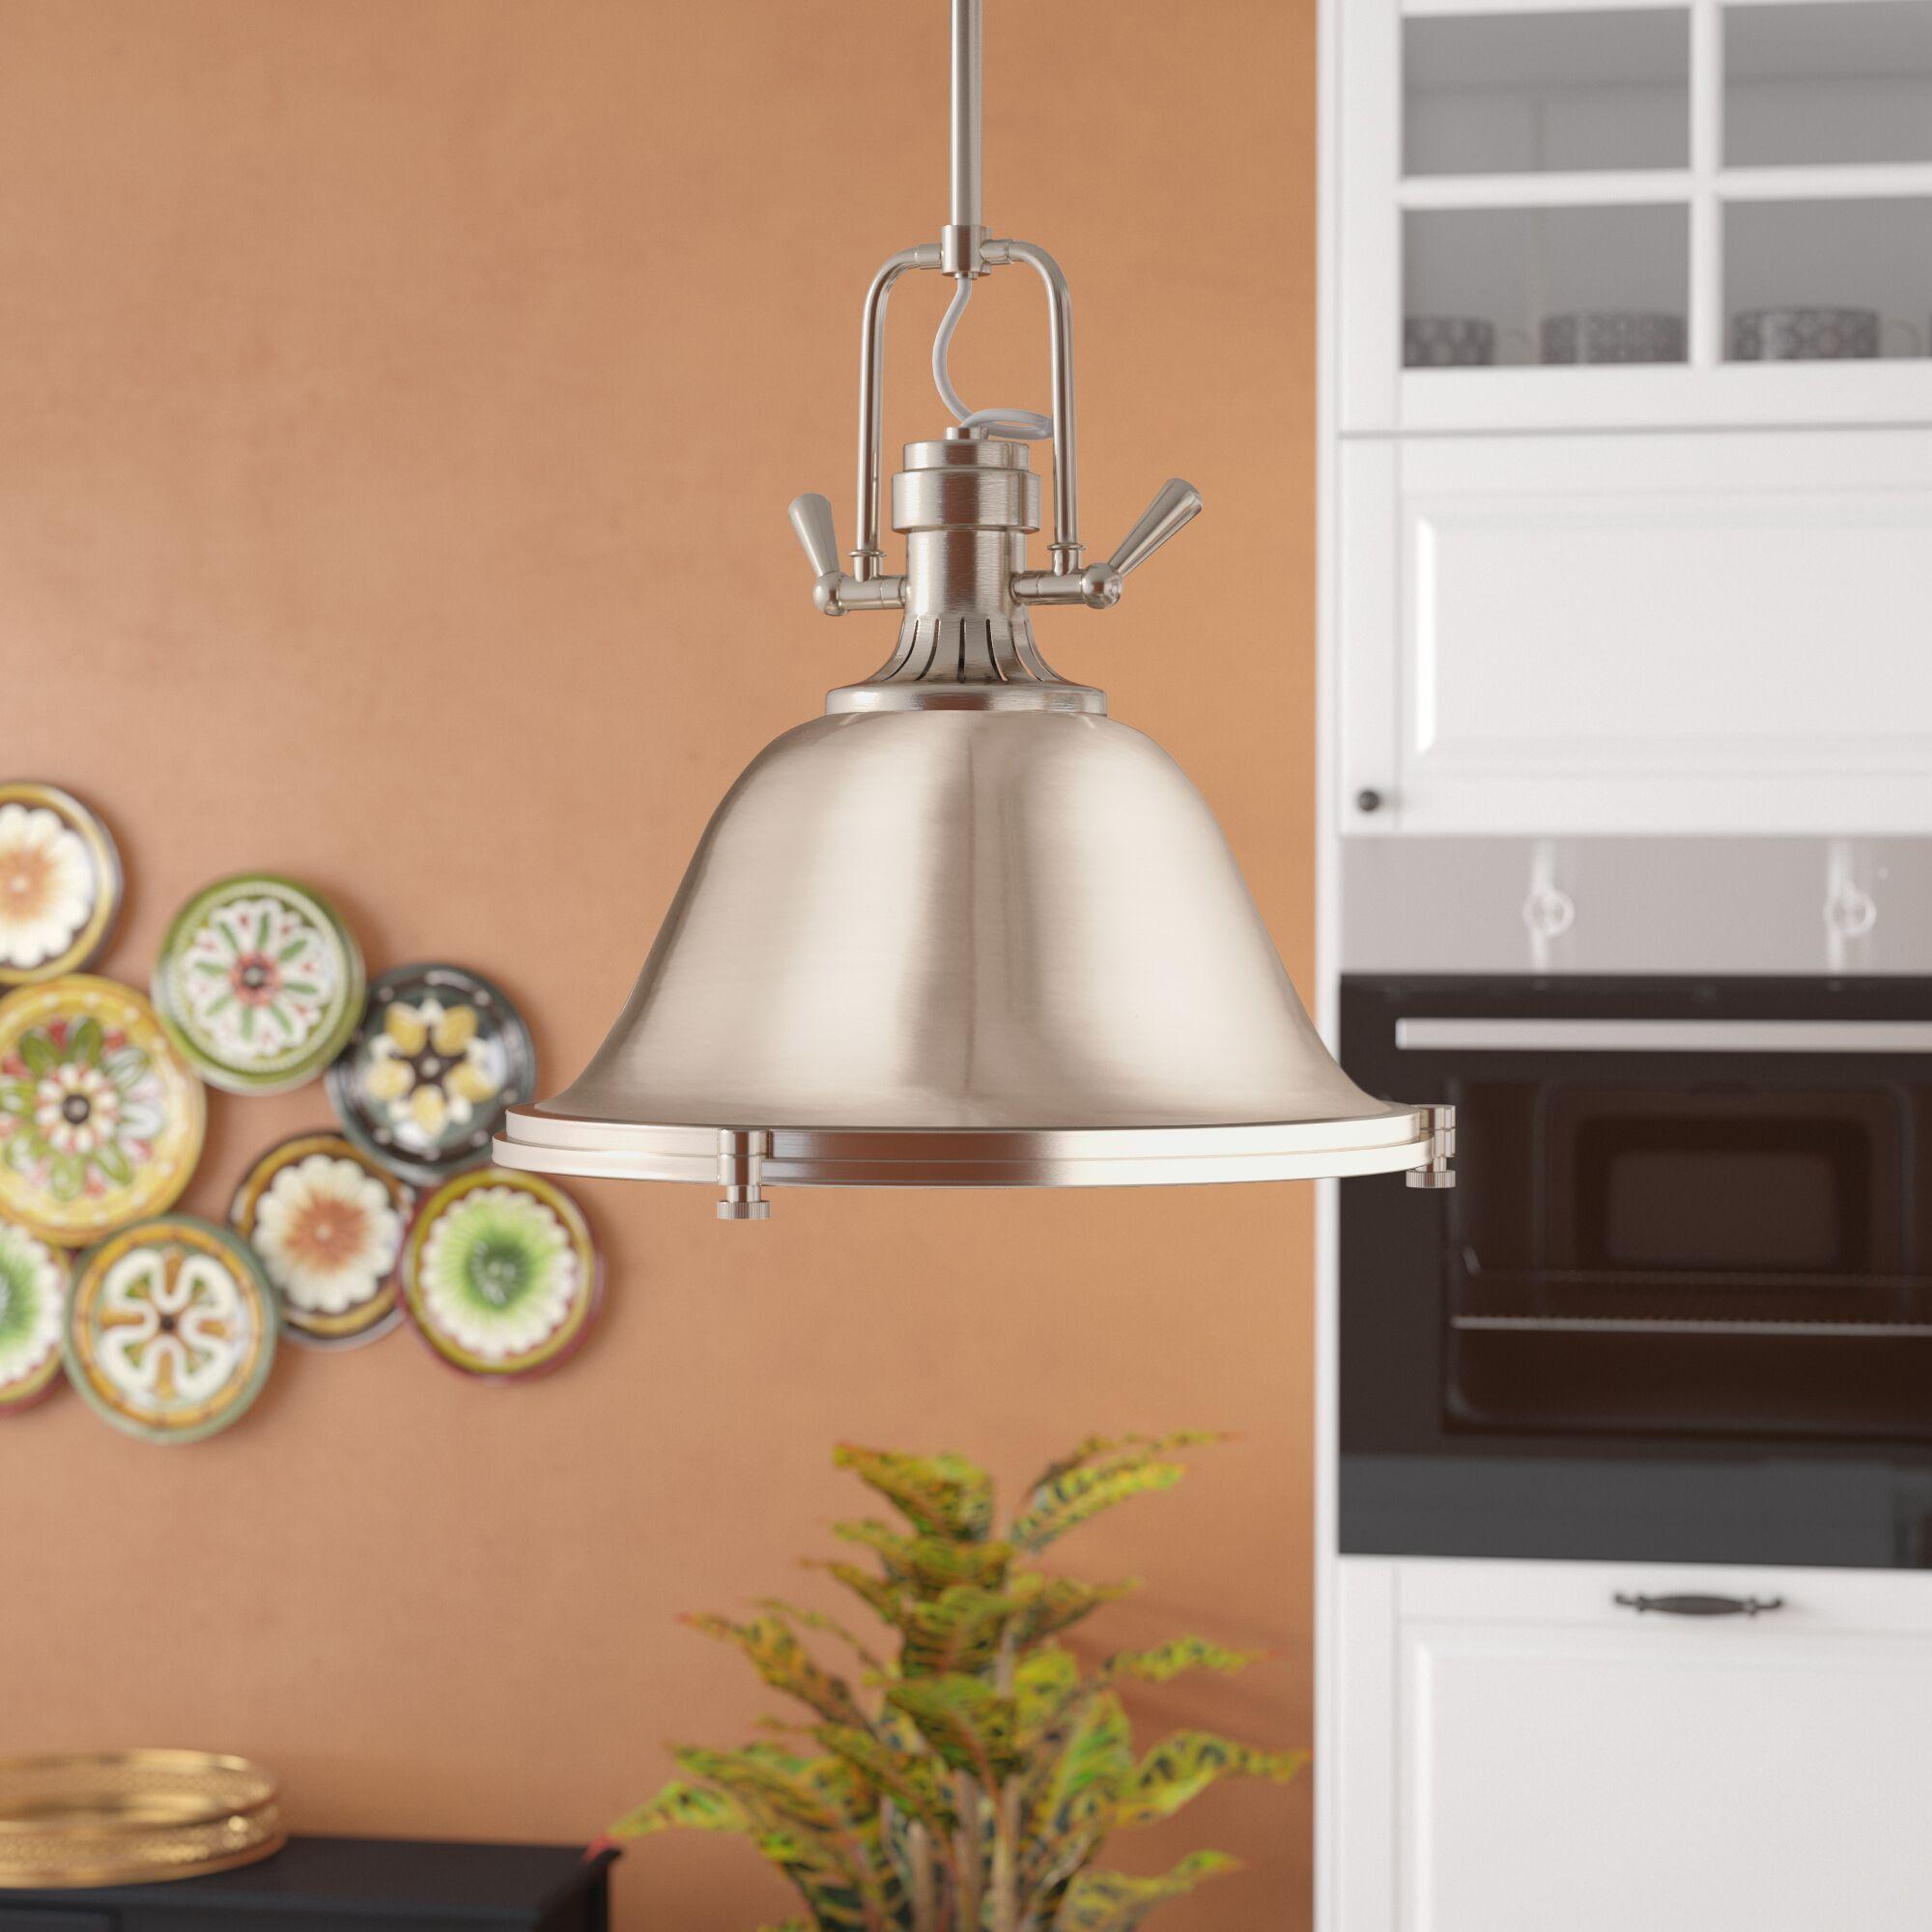 Chiaramonte 2-Light Bell Pendant Finish: Brushed Nickel